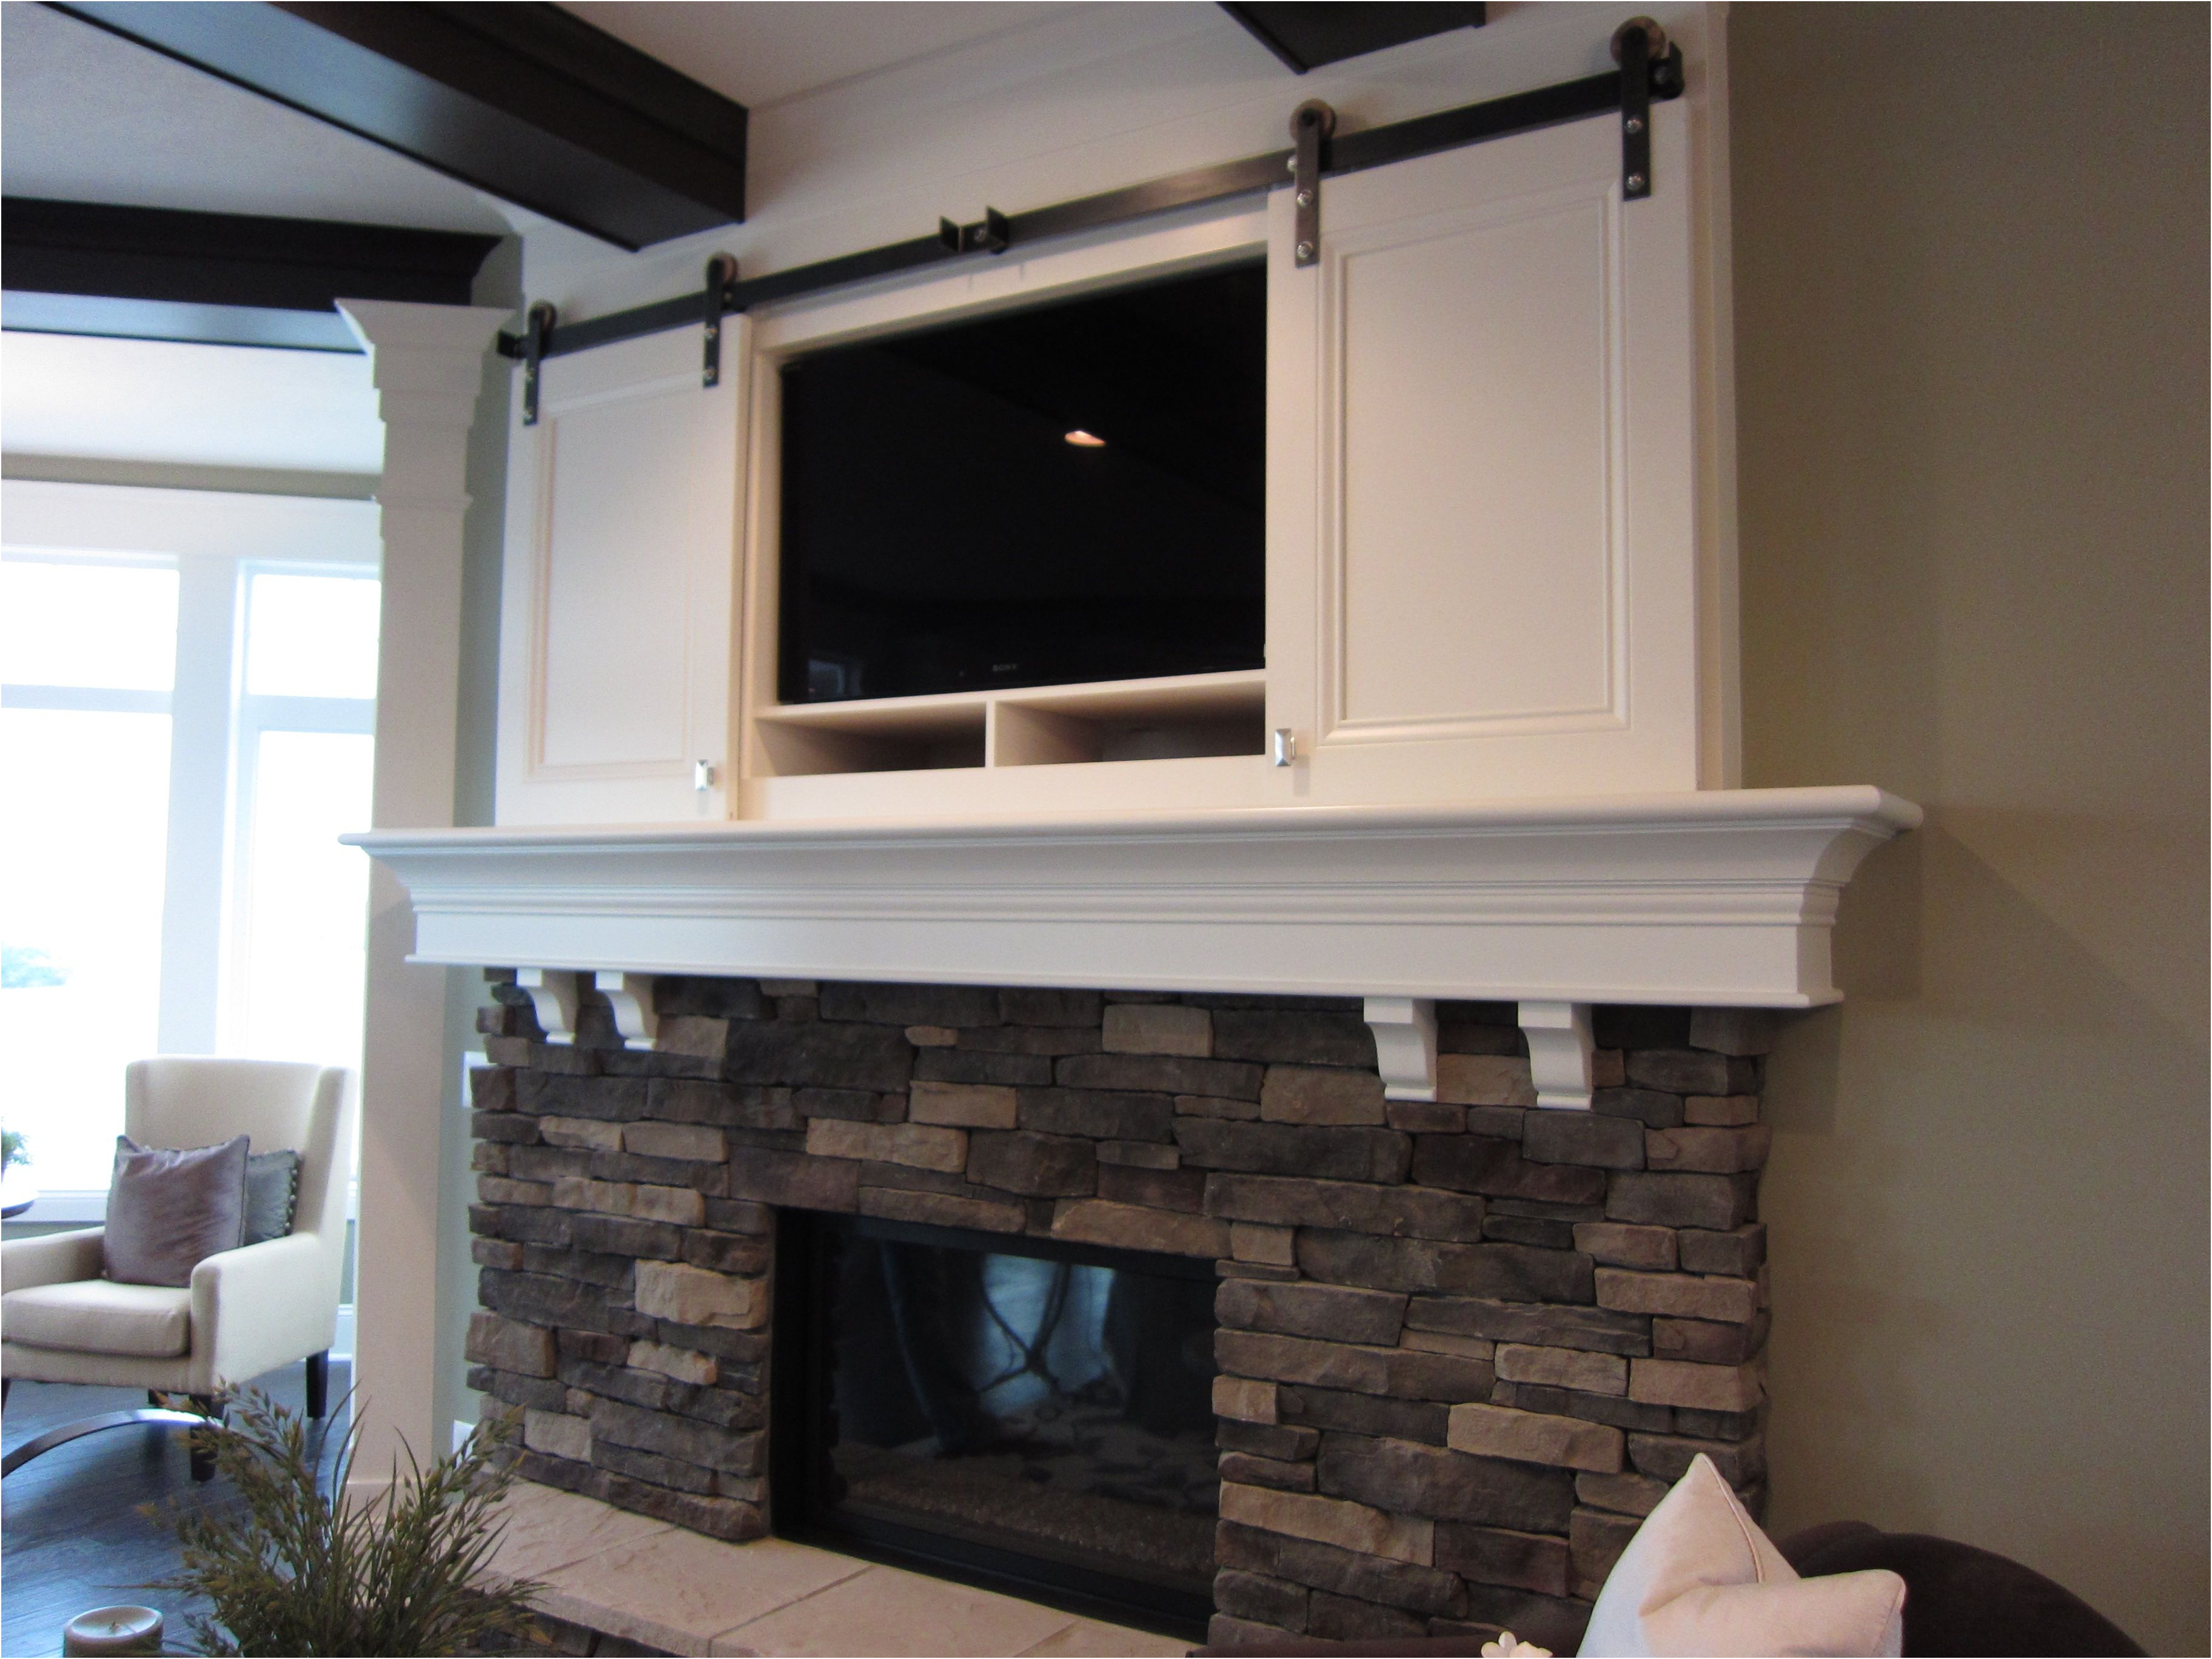 Fireplace Ideas On Pinterest Luxury Fireplace Tv Mantel Ideas Best 25 Tv Above Fireplace Ideas